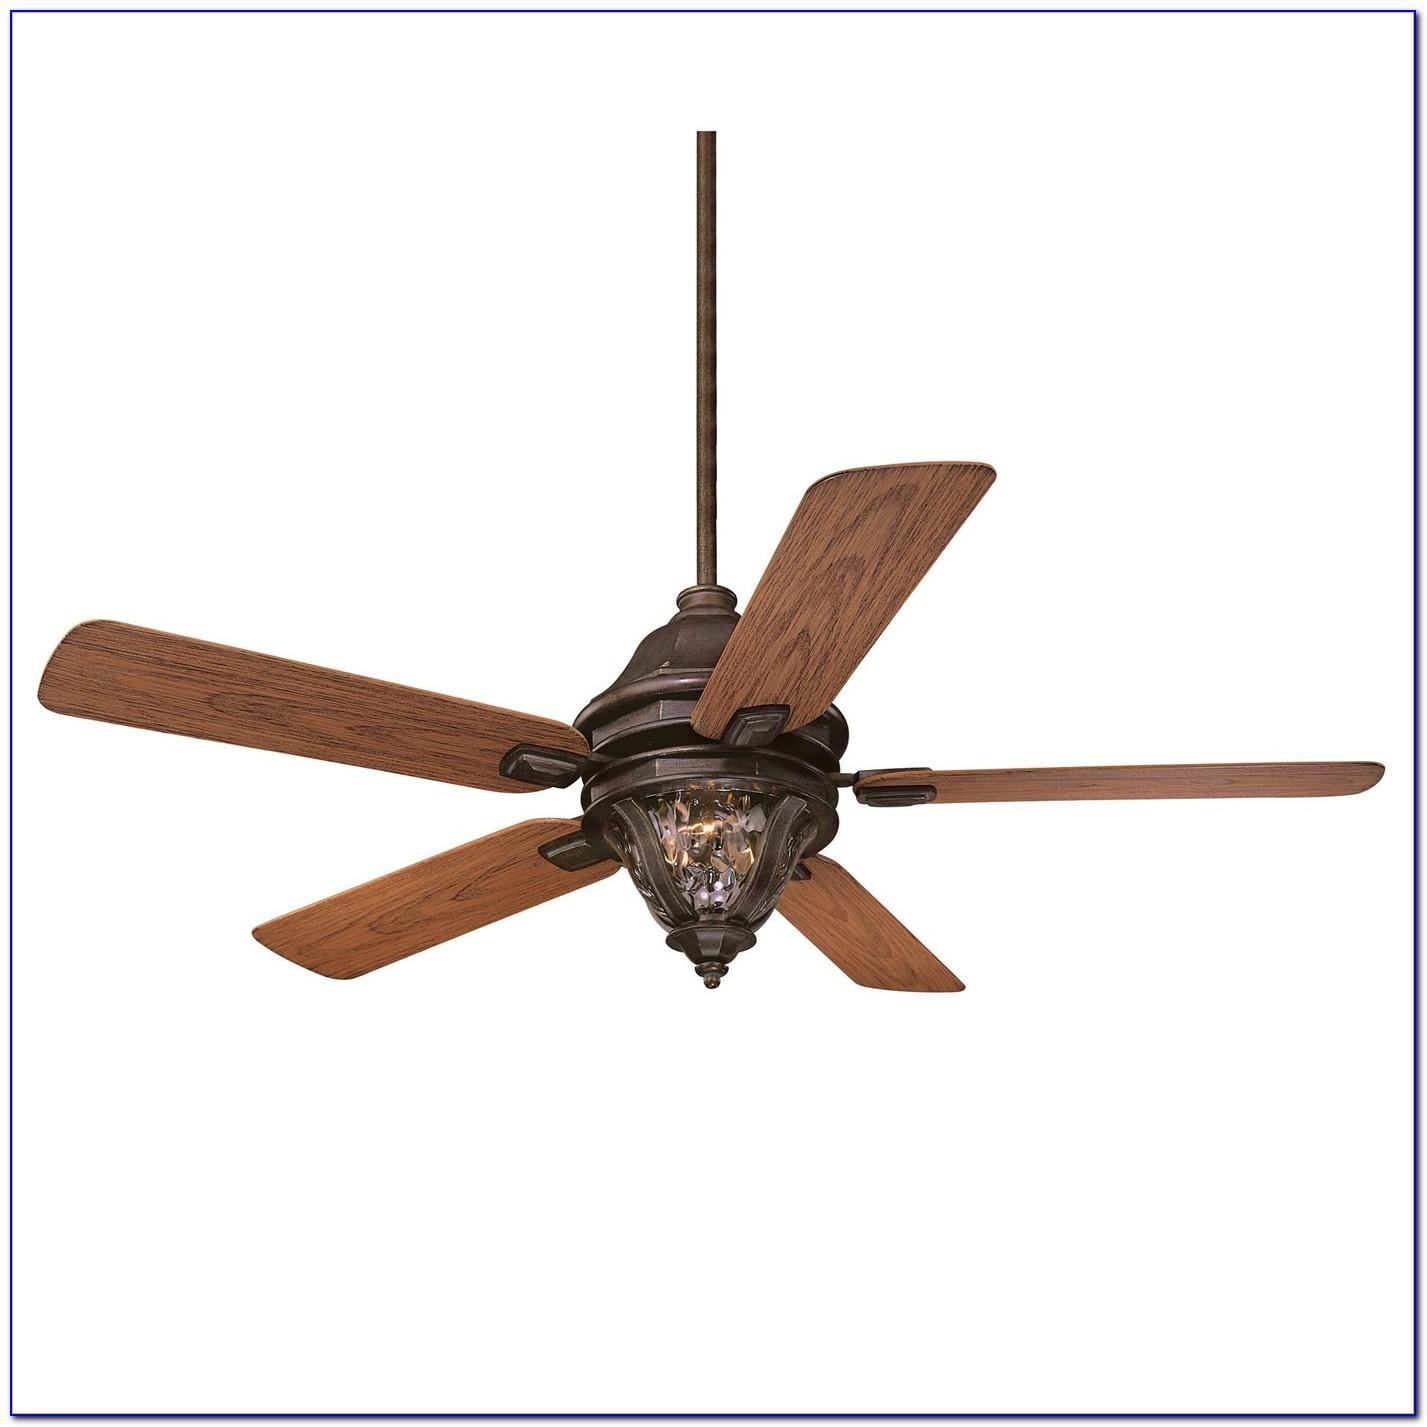 Savoy House Ceiling Fan Manual